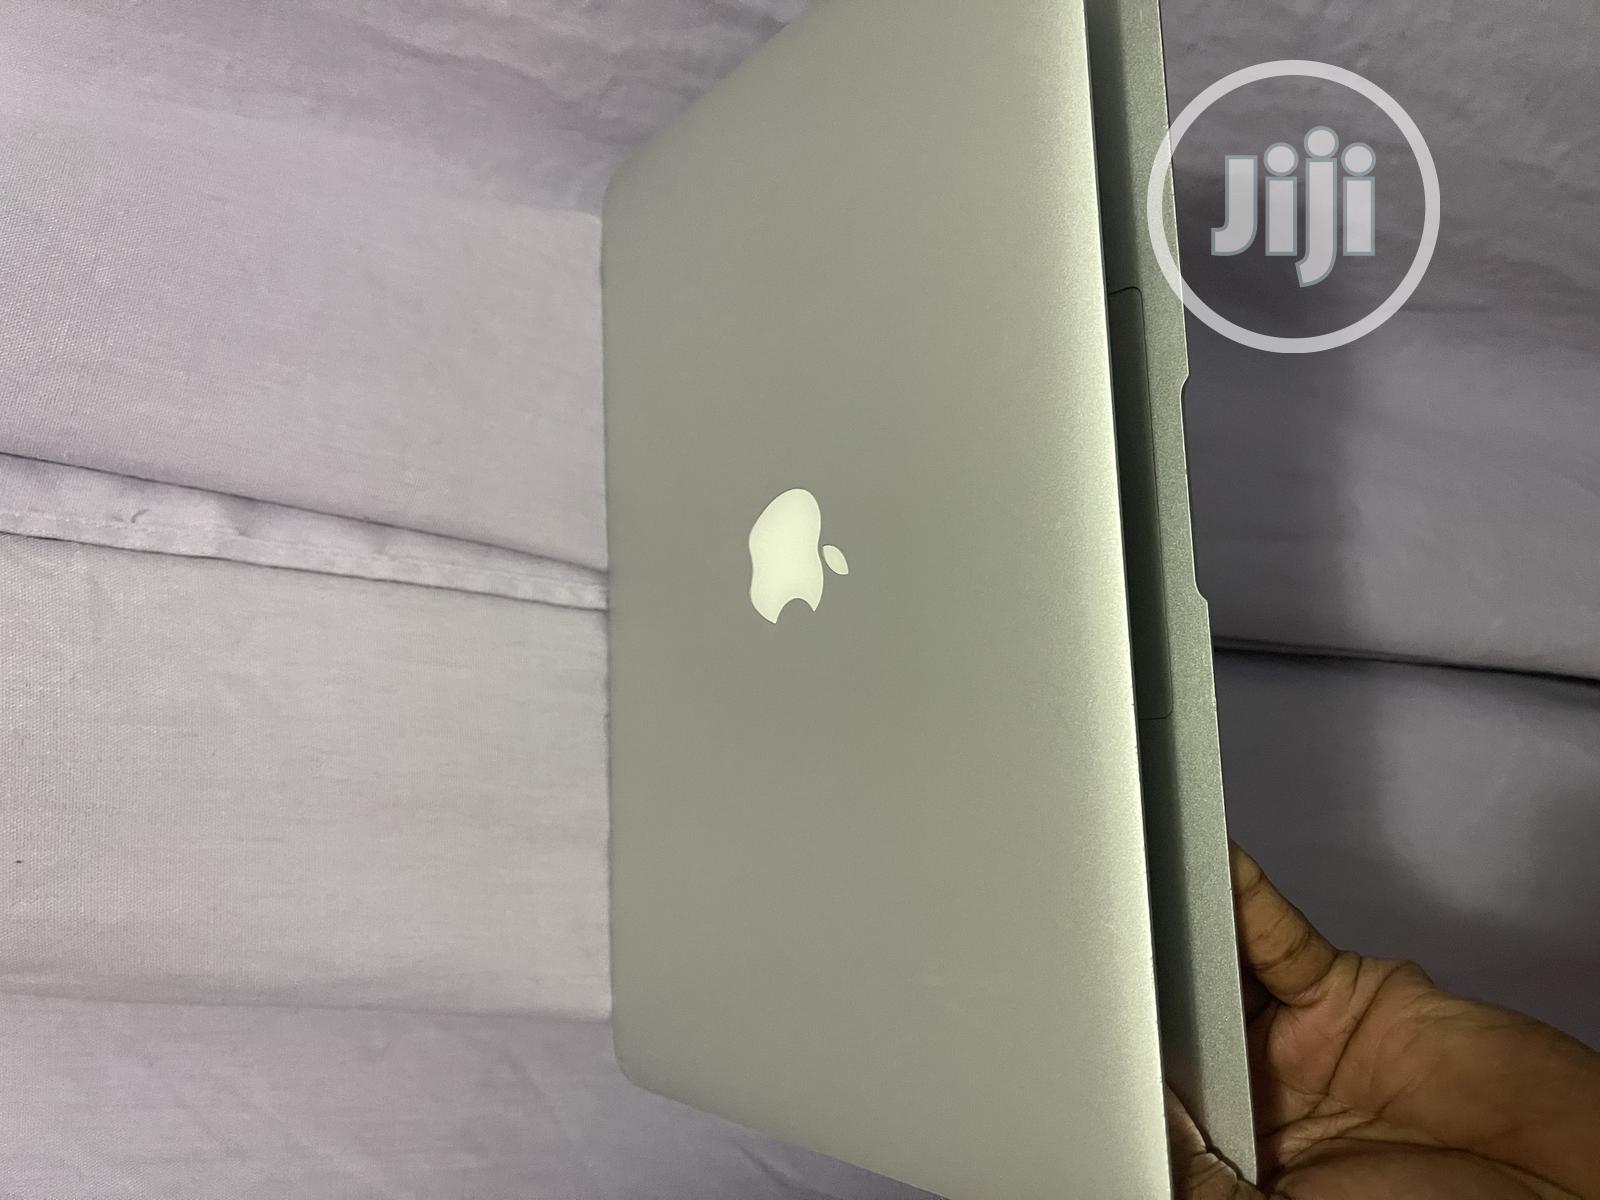 Laptop Apple MacBook Air 2013 8GB Intel Core i7 SSD 512GB | Laptops & Computers for sale in Osogbo, Osun State, Nigeria